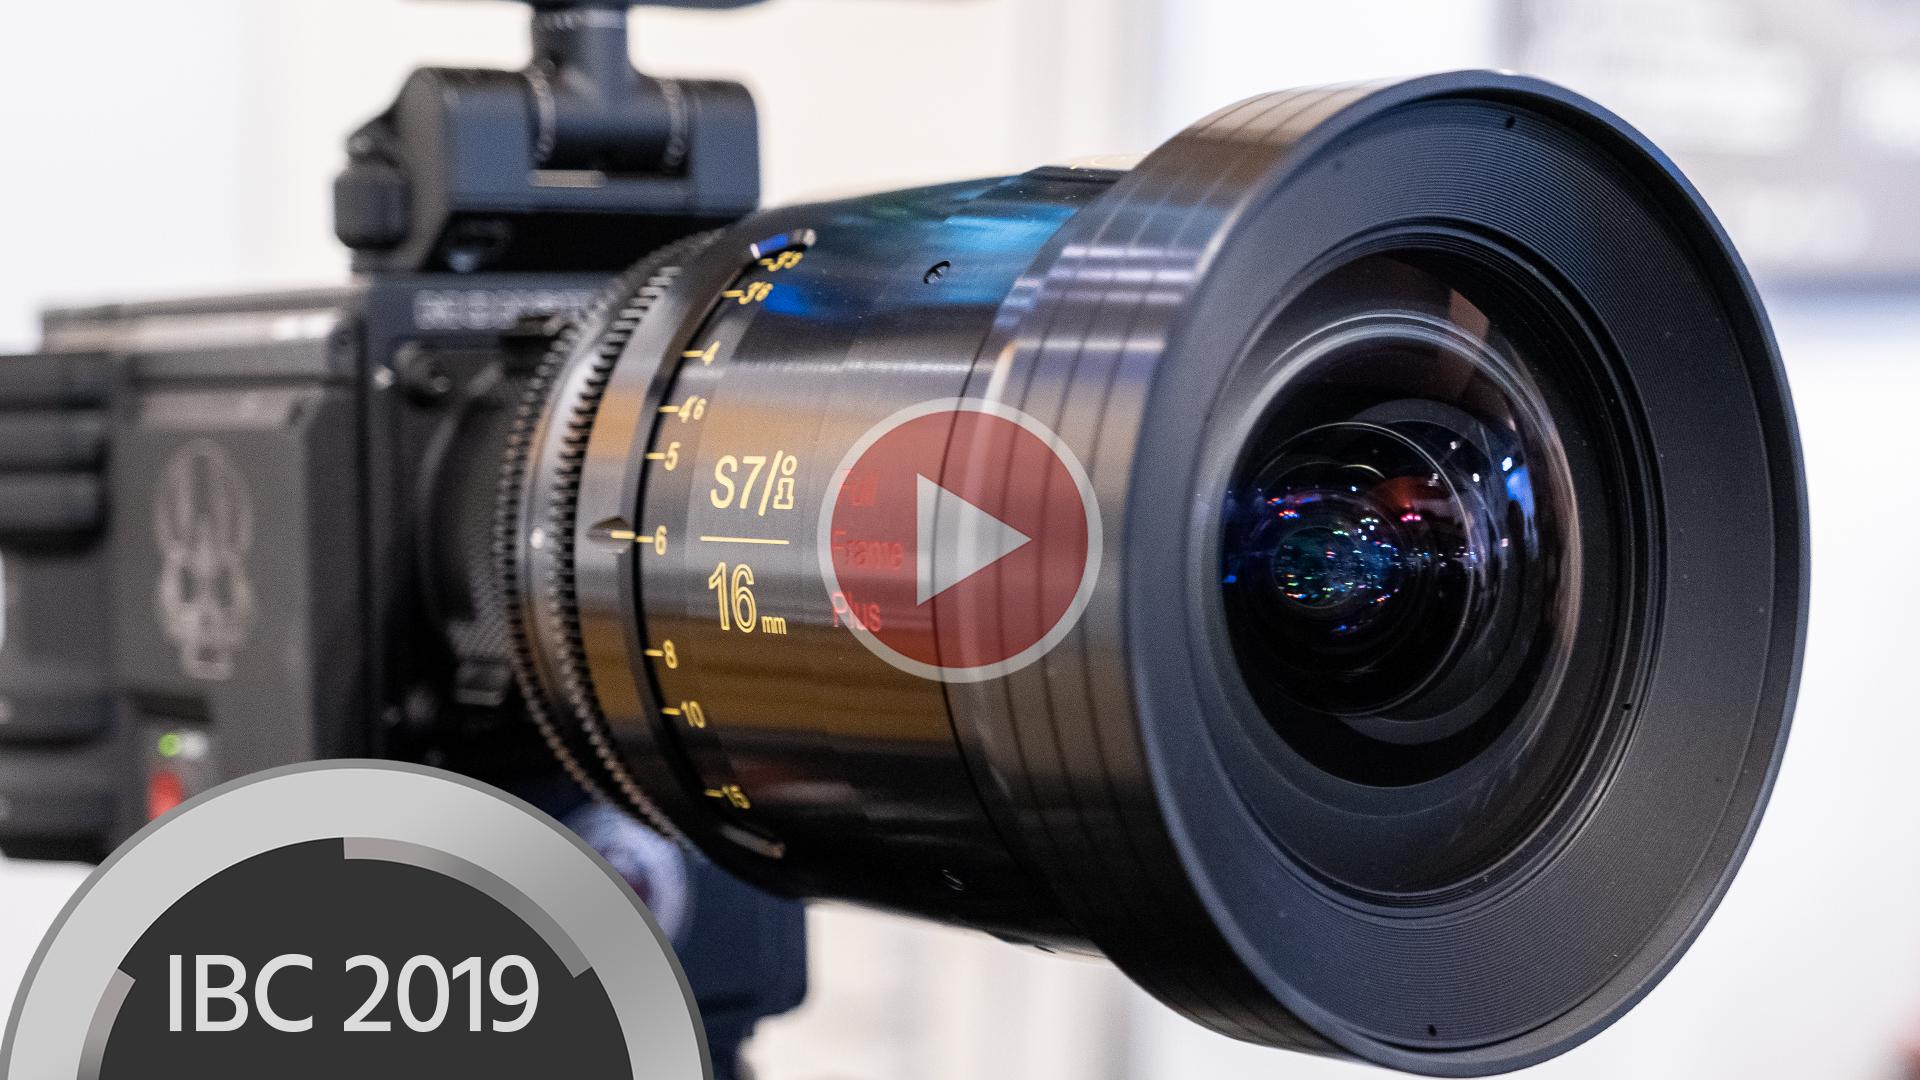 Presentan el Cooke S7/i 16mm Full Frame Plus y el Anamorphic/i 135mm FF+